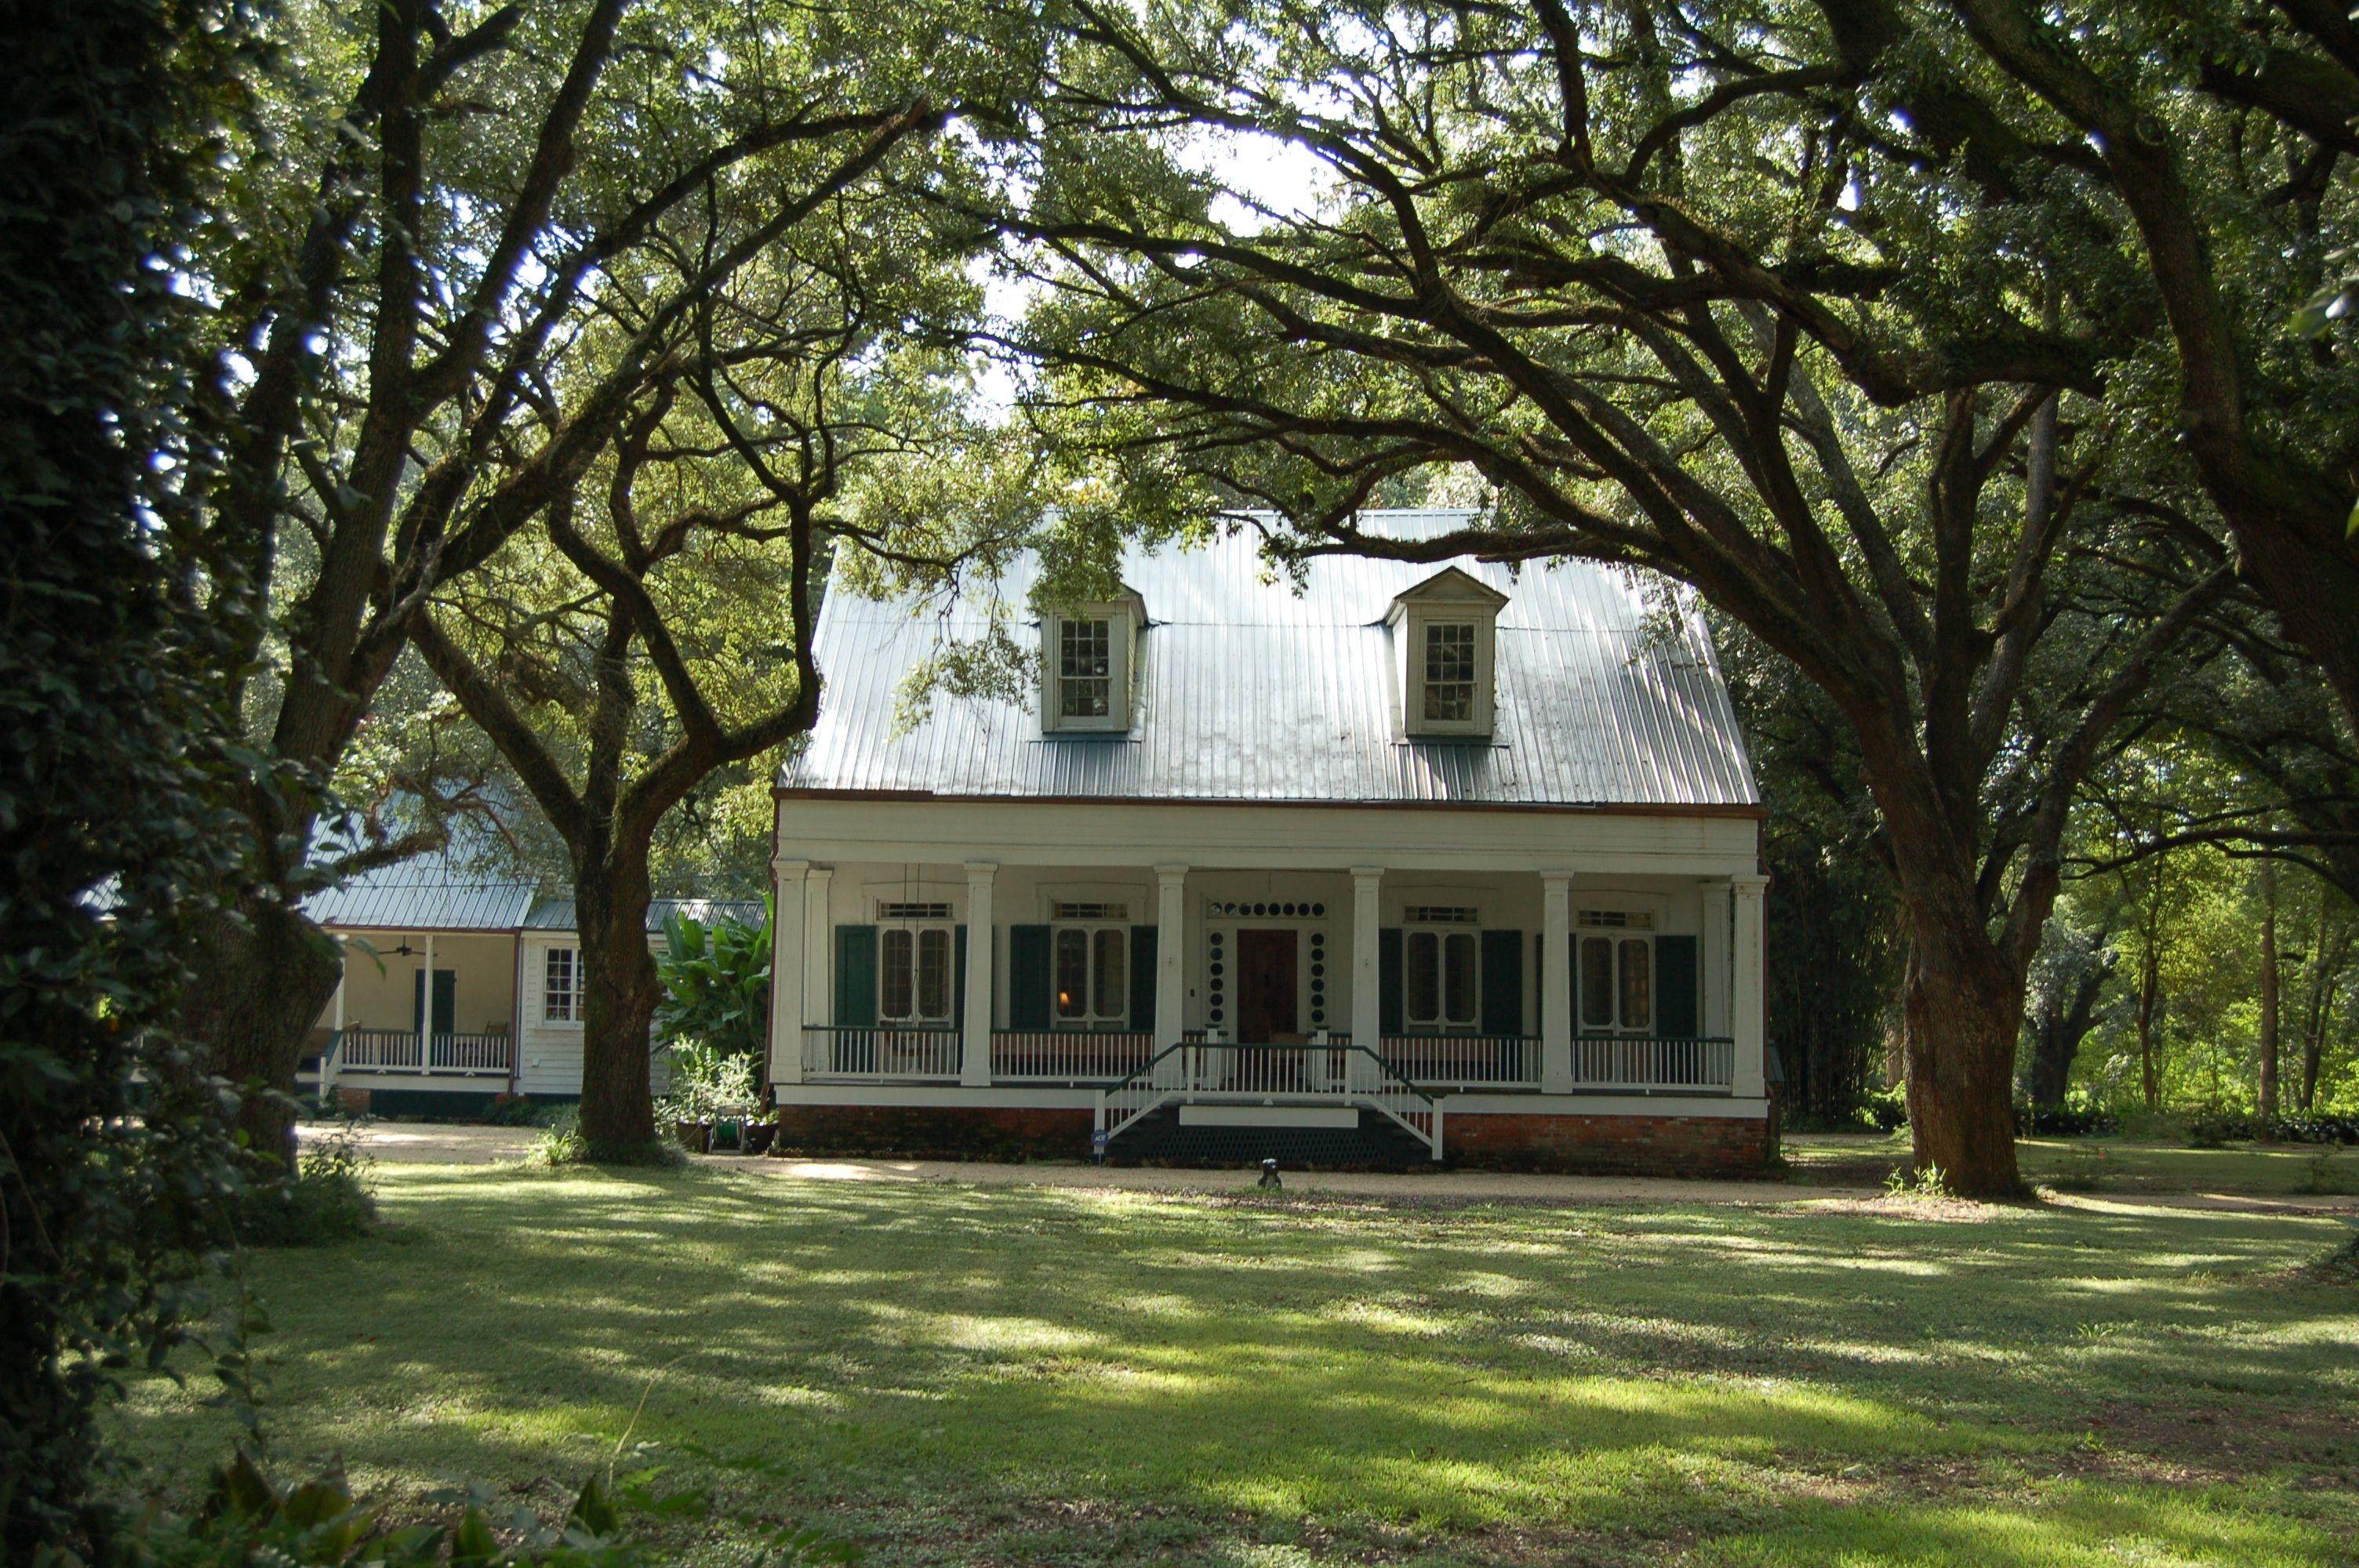 Best Kitchen Gallery: Plantation Style House Plans With Porches Plantation Style House of Louisiana Plantation Home Plans on rachelxblog.com